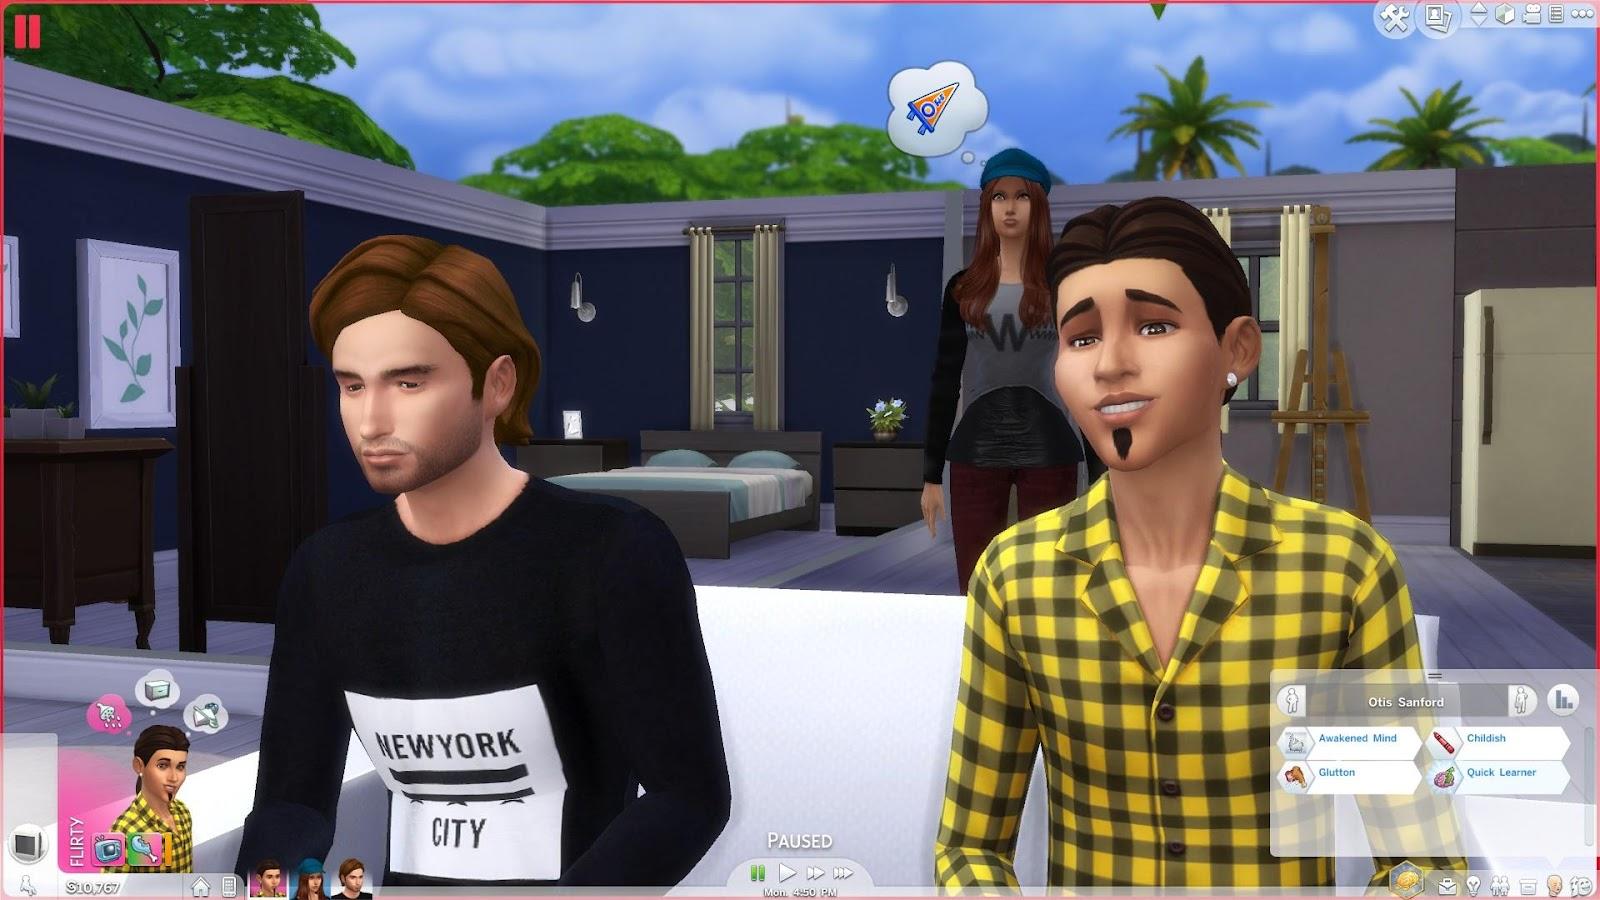 Sims 4 Trait mod - Awakened Mind